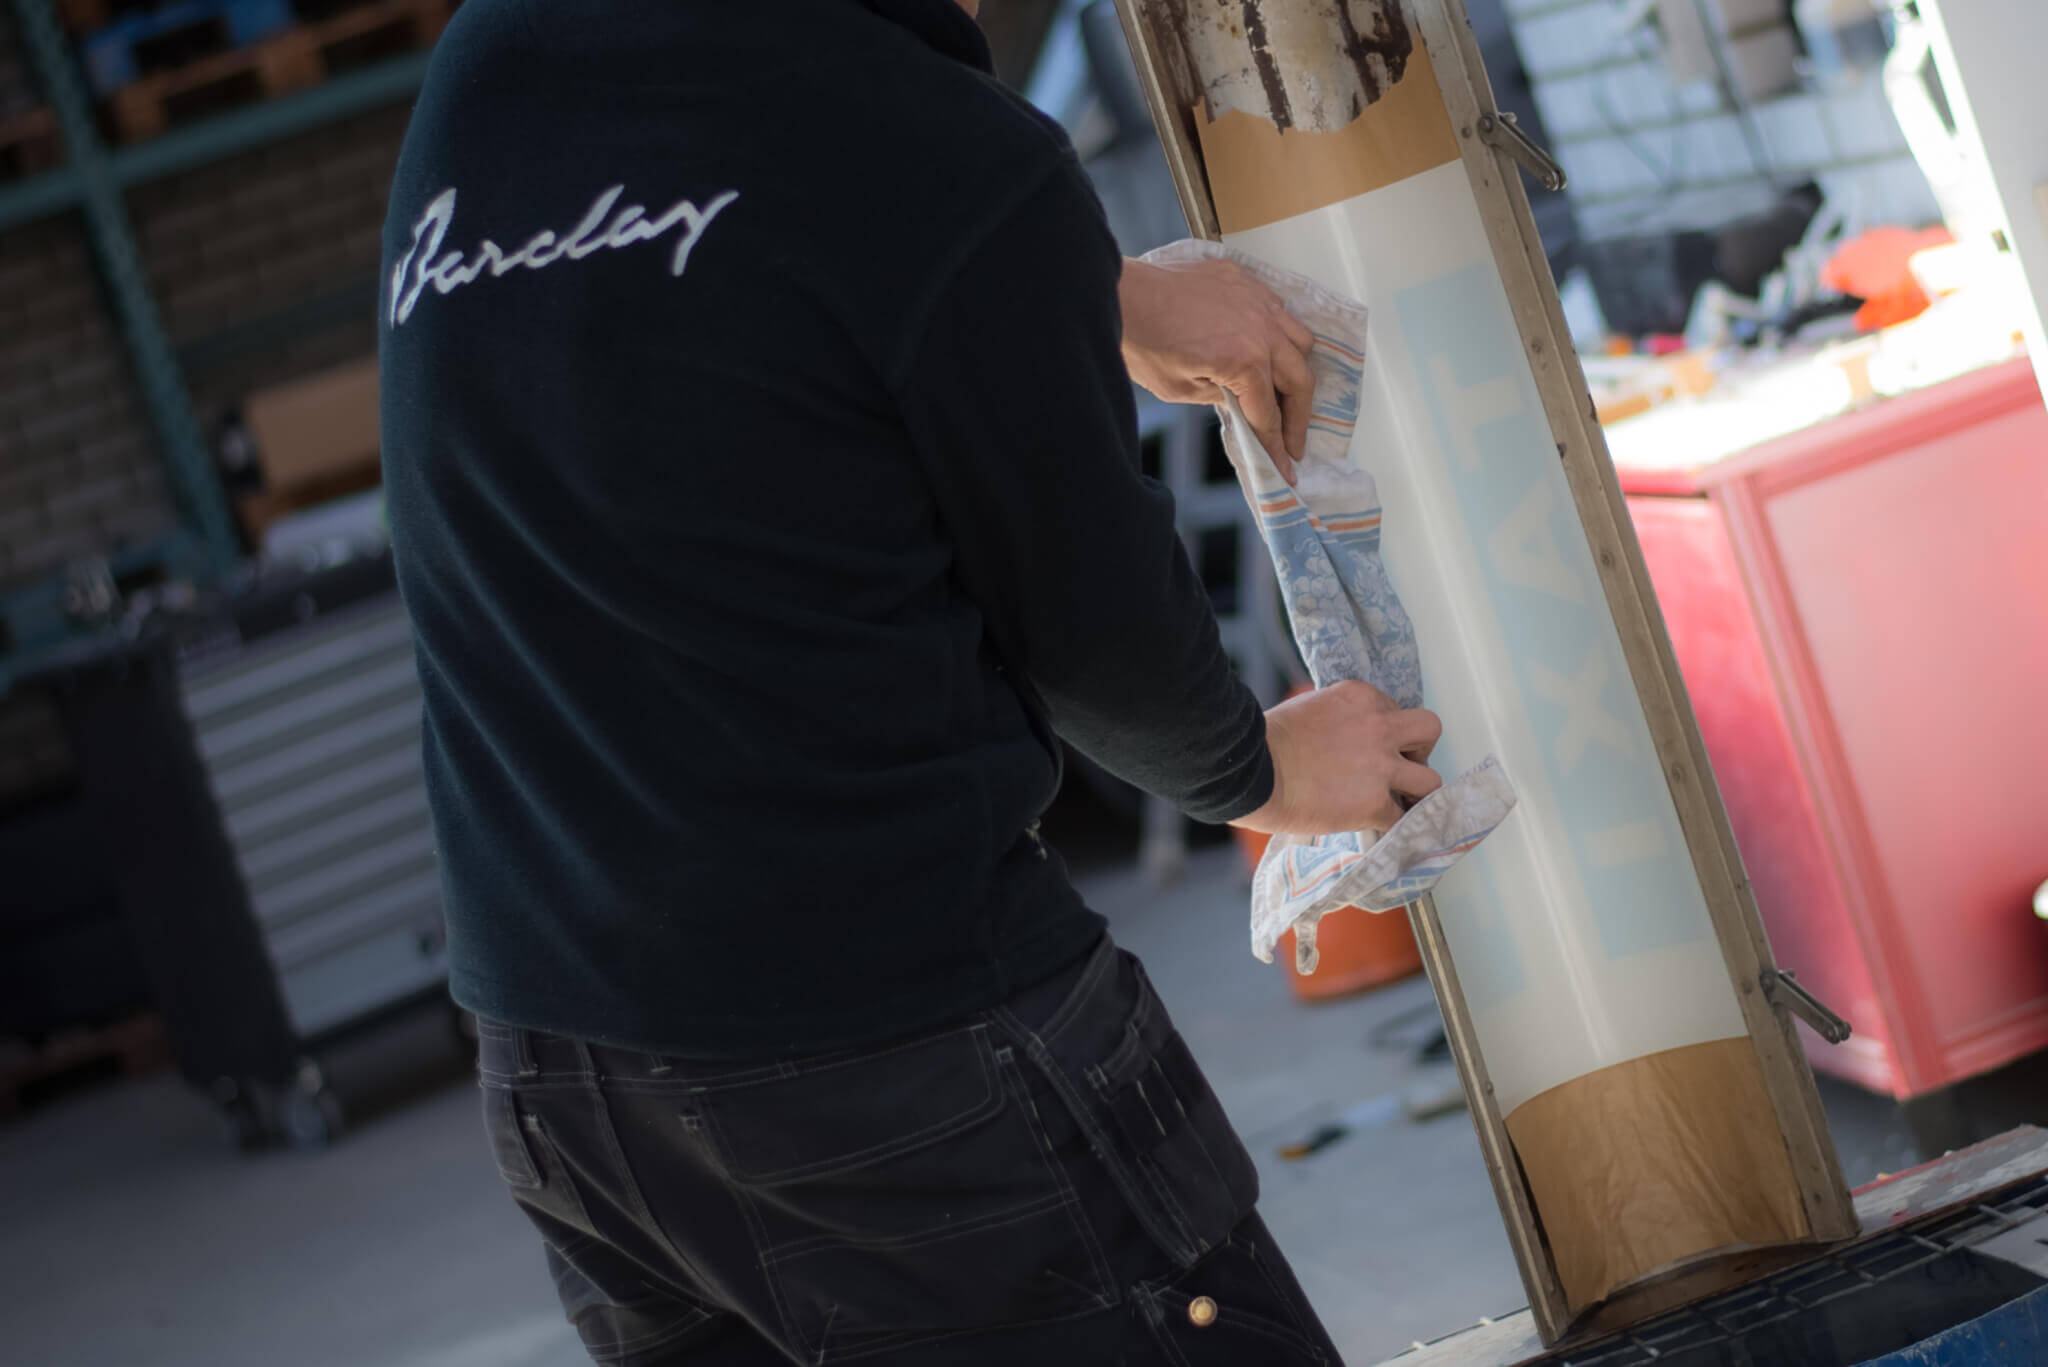 Barclay Toplights - daklicht fabricage